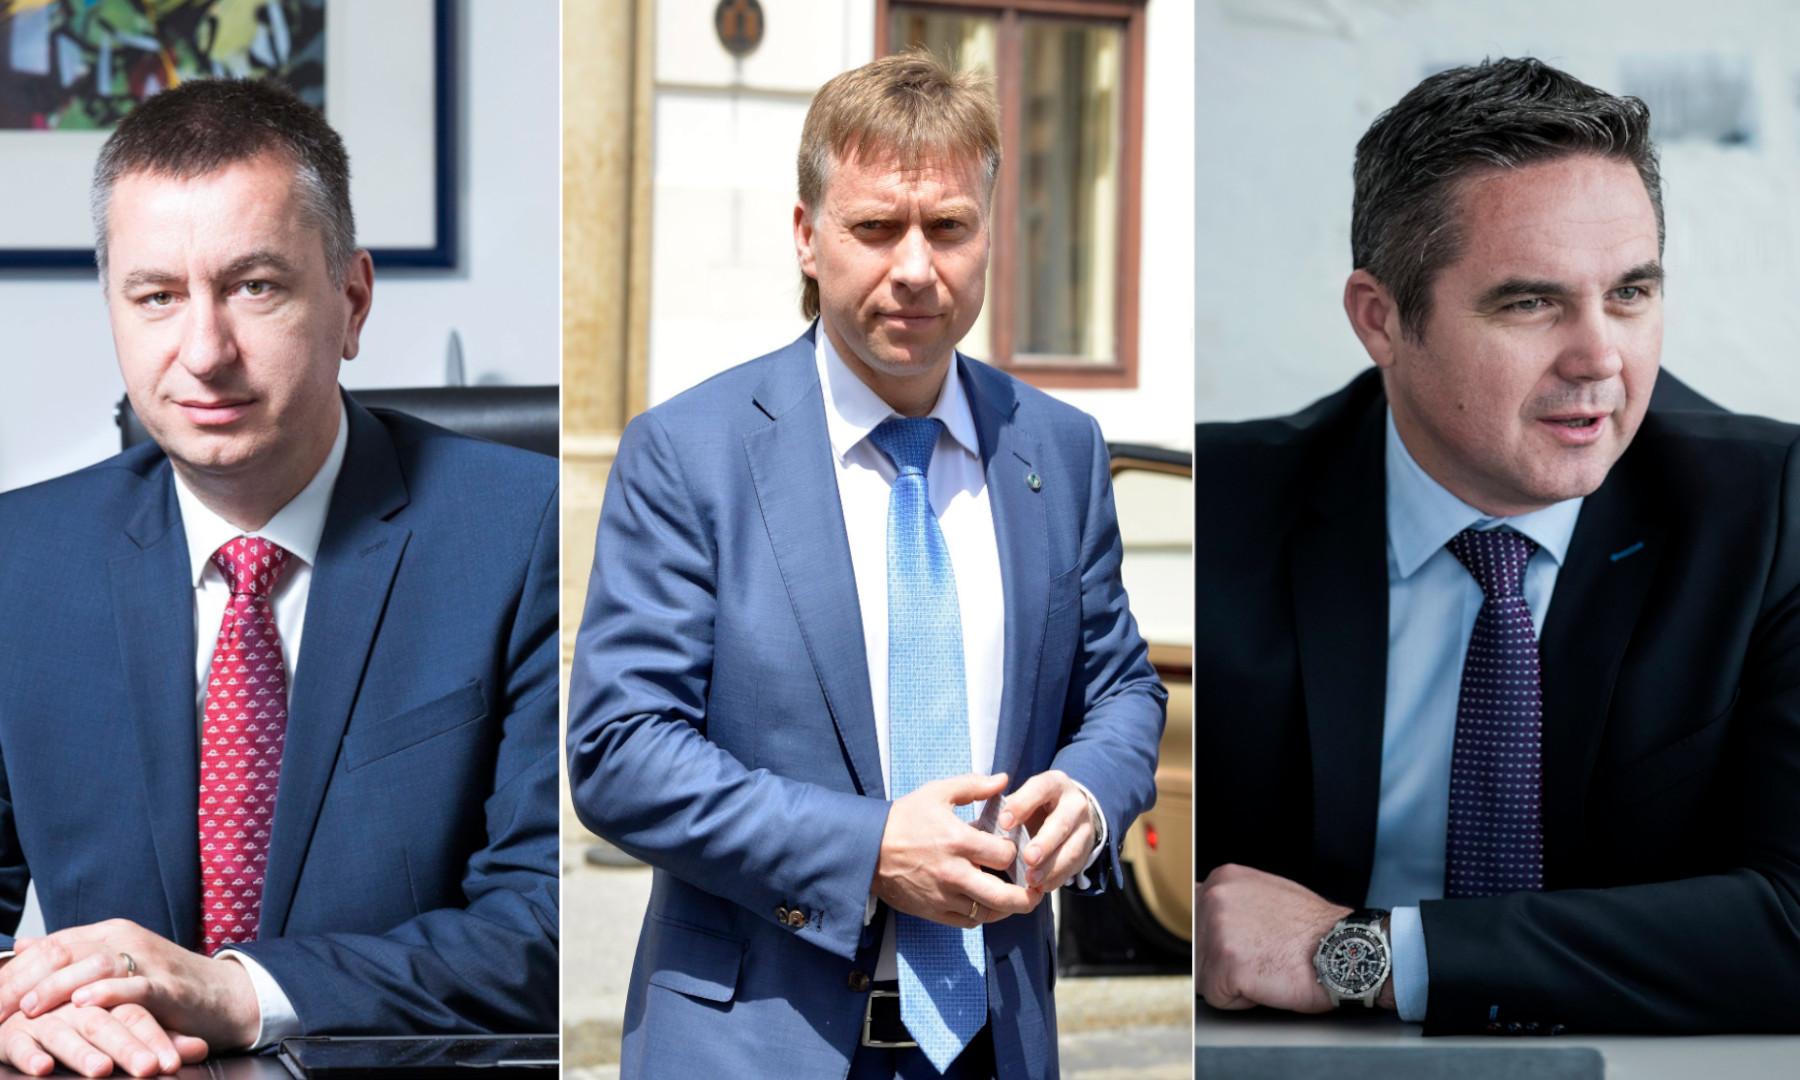 Fabri Peruško, Maksim Poletaev, Marin Pucar